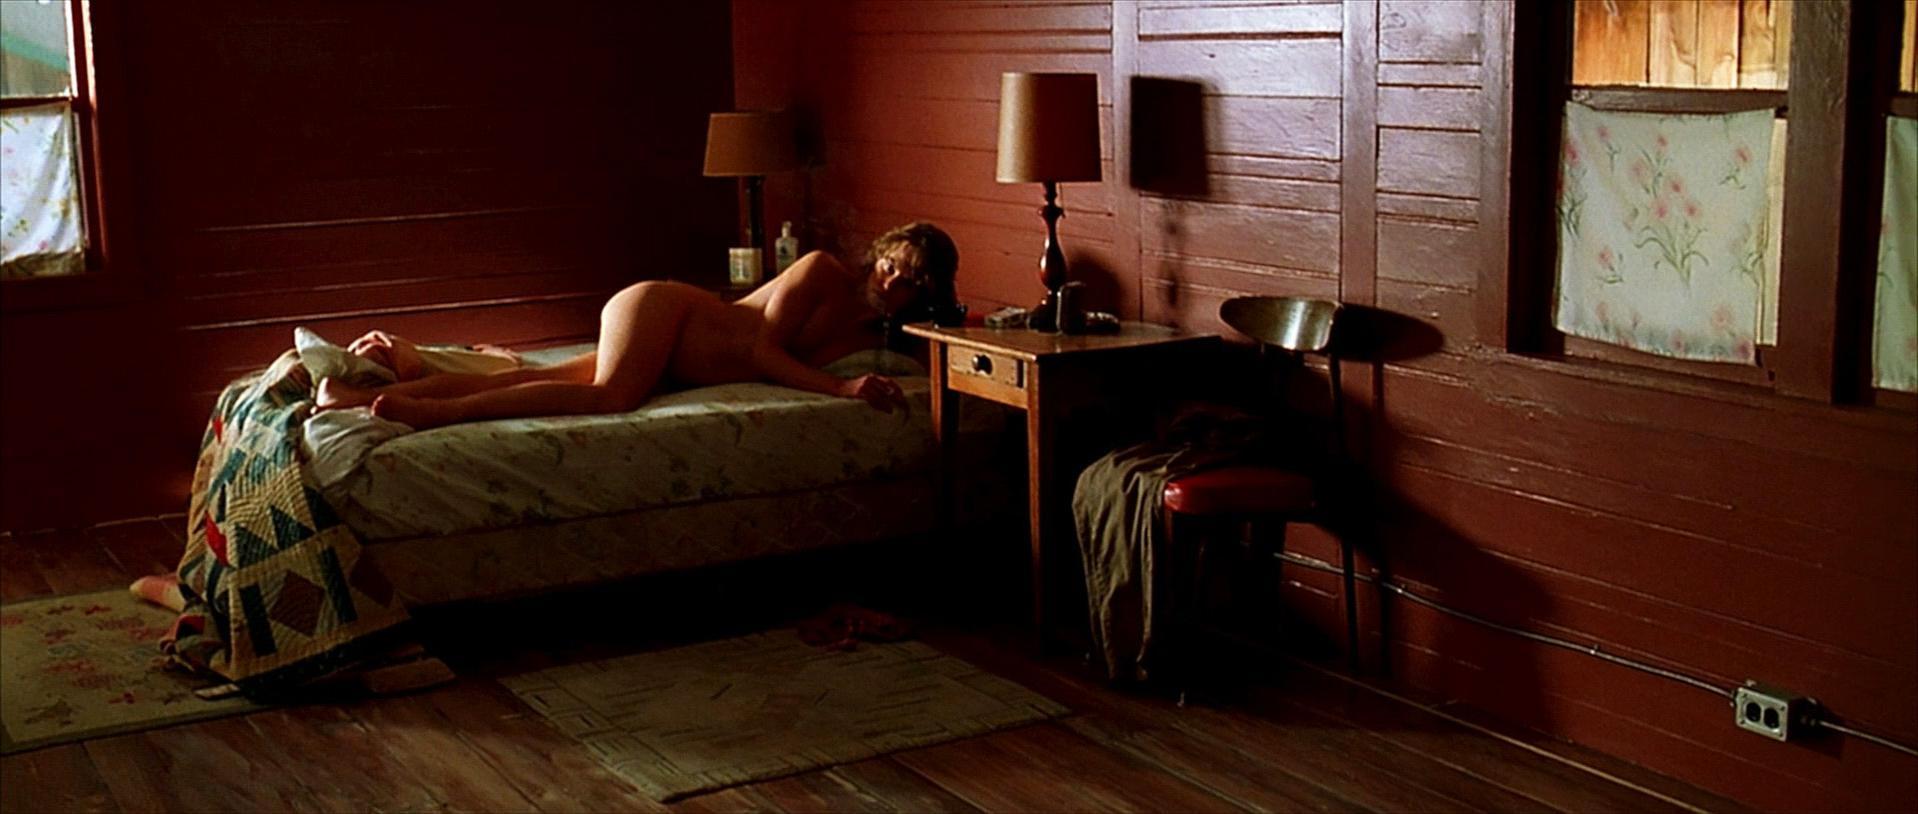 Nicole Kidman nude - The Human Stain (2003)